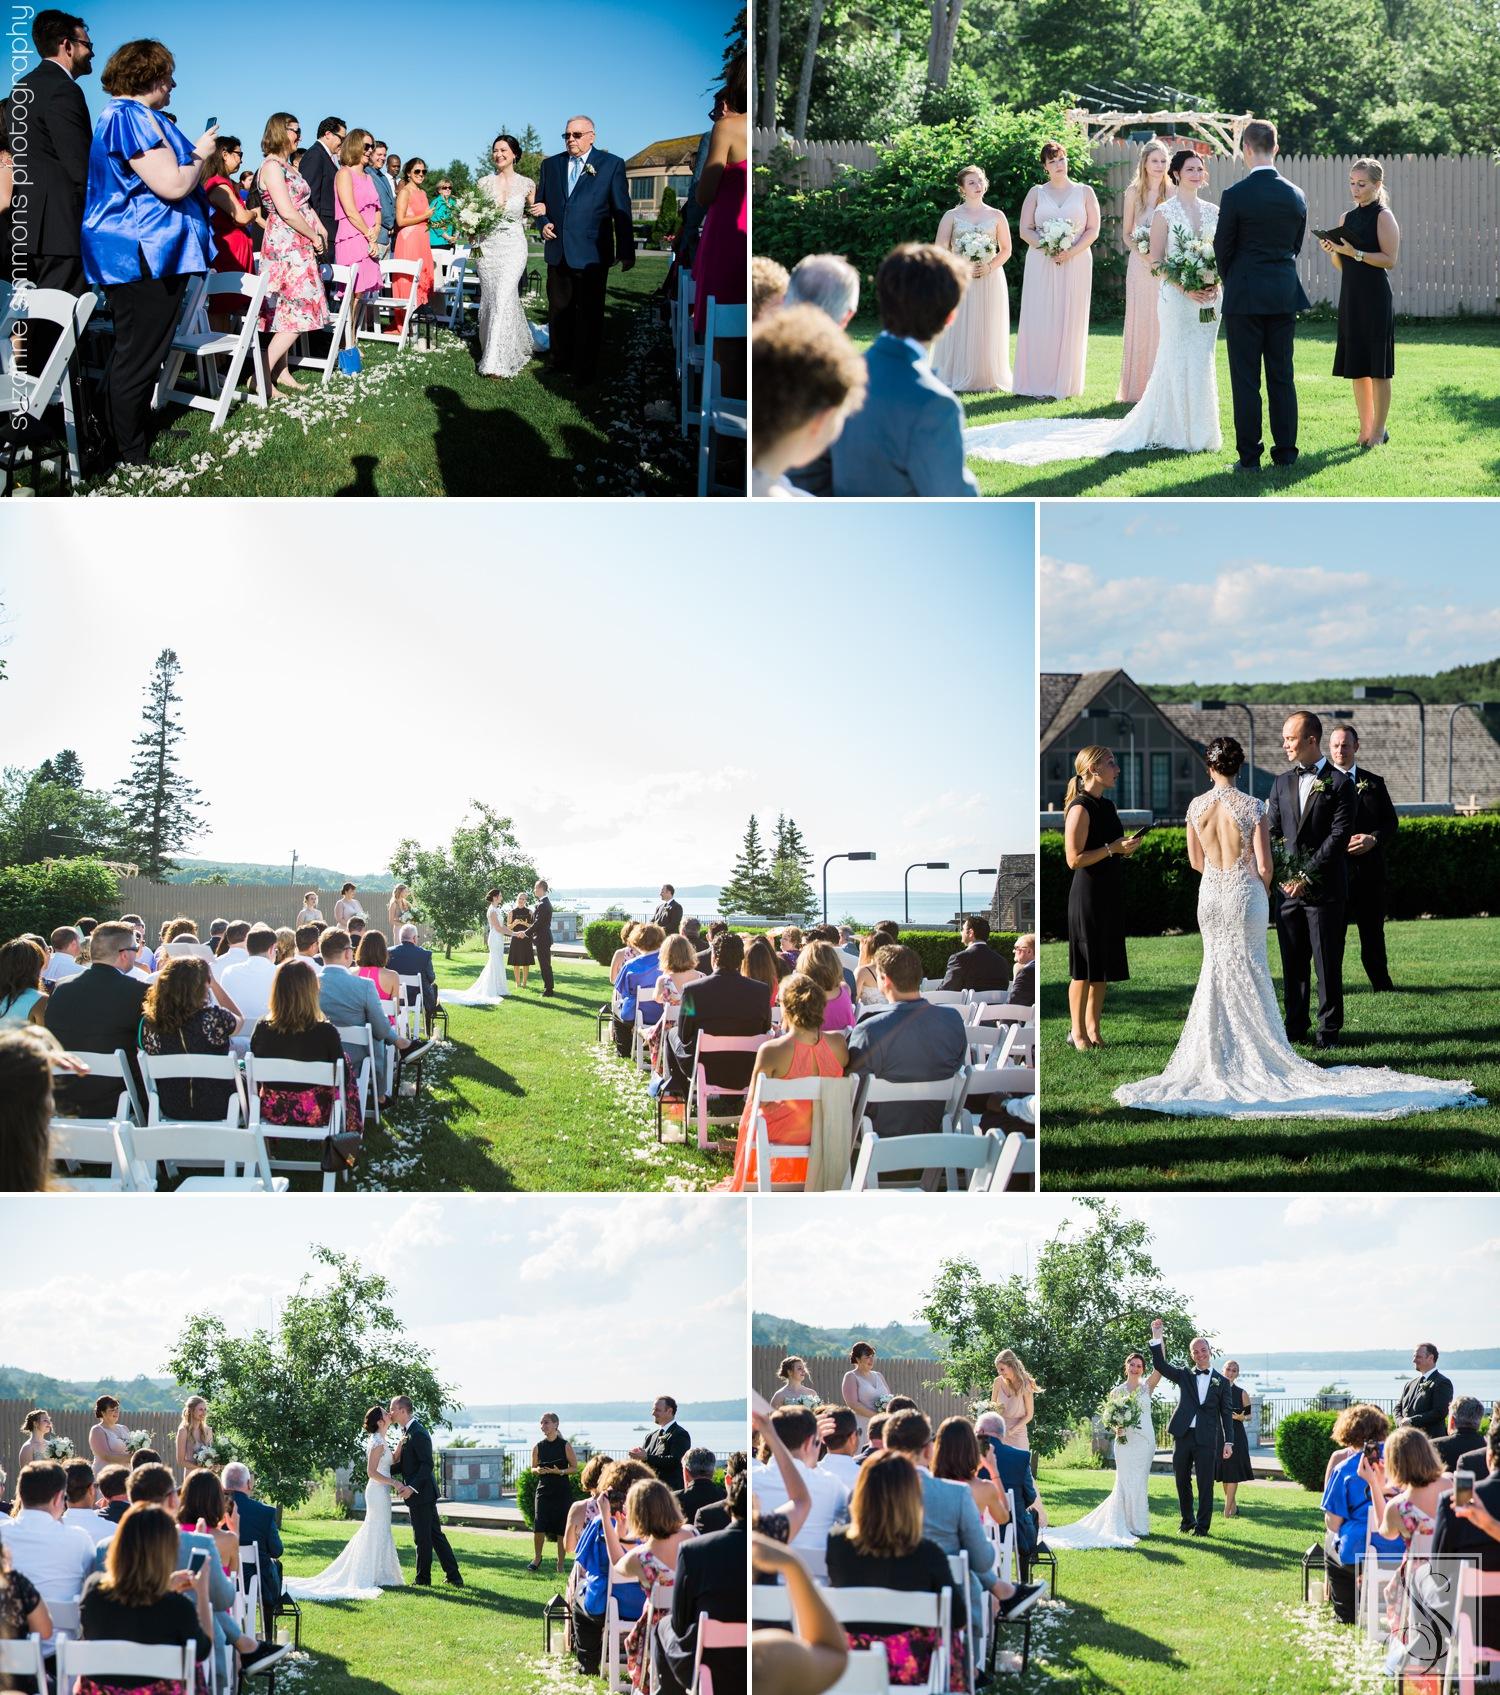 Wedding ceremony at the Bar Harbor Club in Bar Harbor, Maine